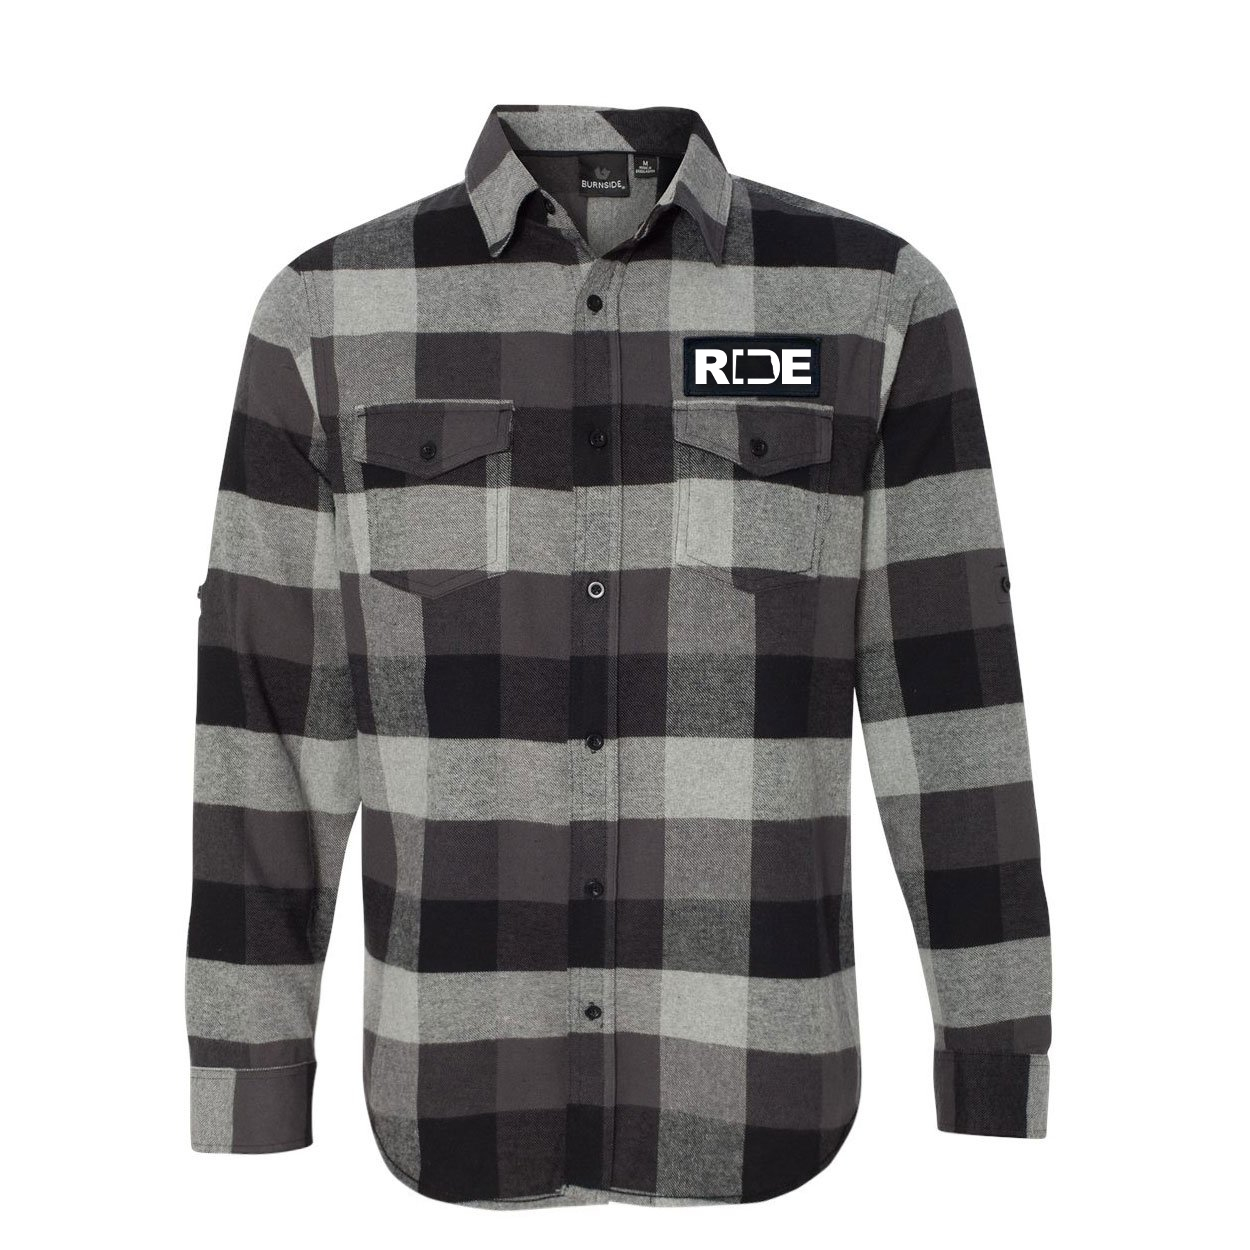 Ride North Dakota Classic Unisex Long Sleeve Woven Patch Flannel Shirt Black/Gray (White Logo)